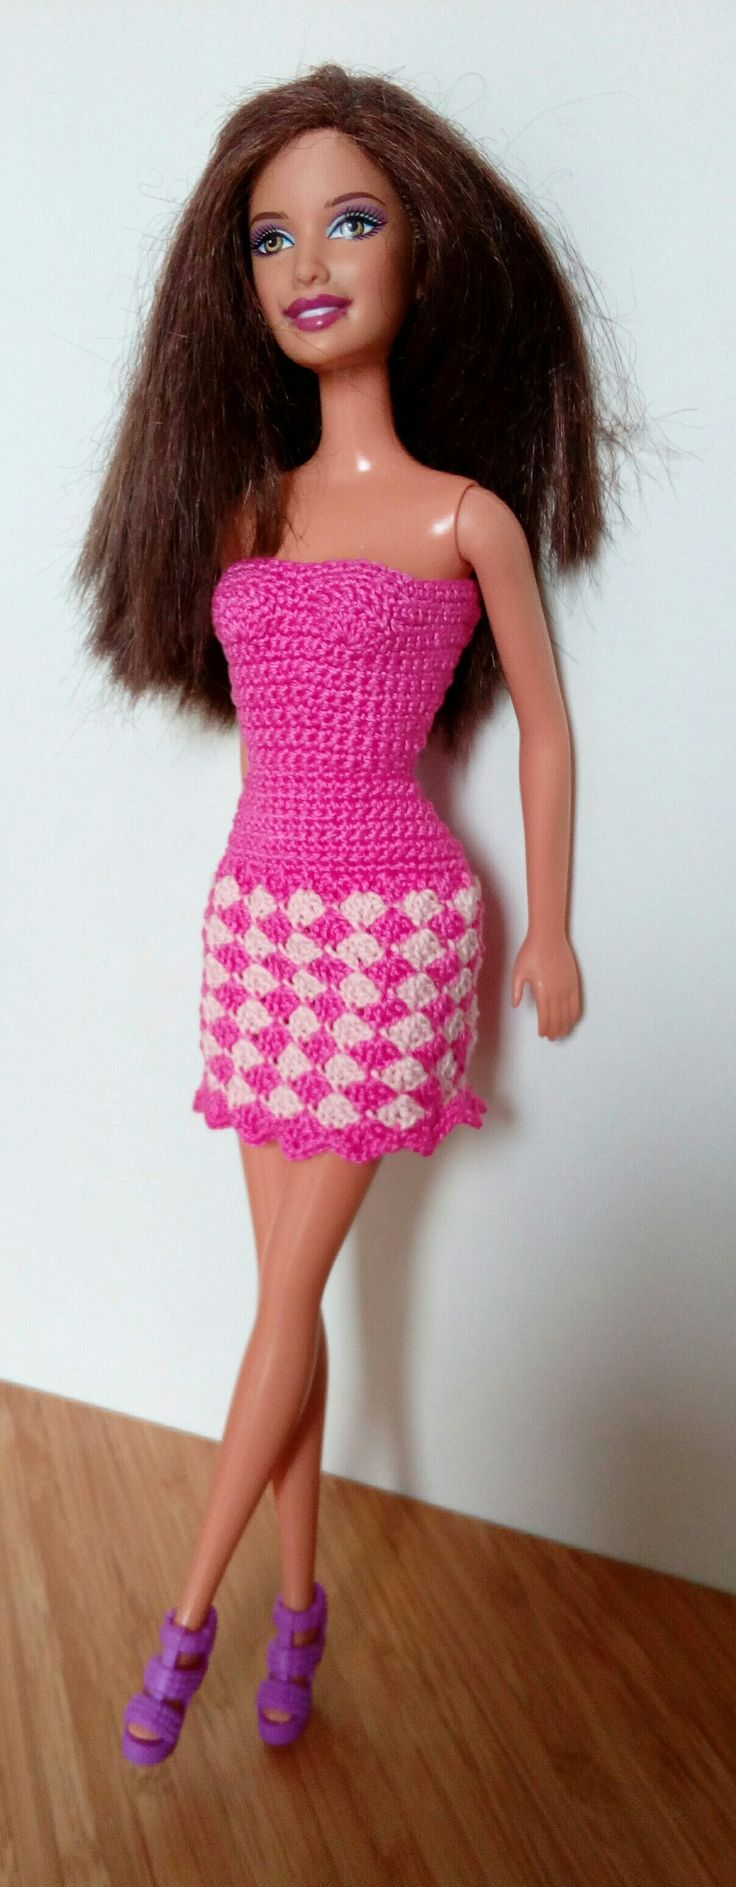 1142 best barbi 2 images on Pinterest | Barbie doll, Barbie dress ...